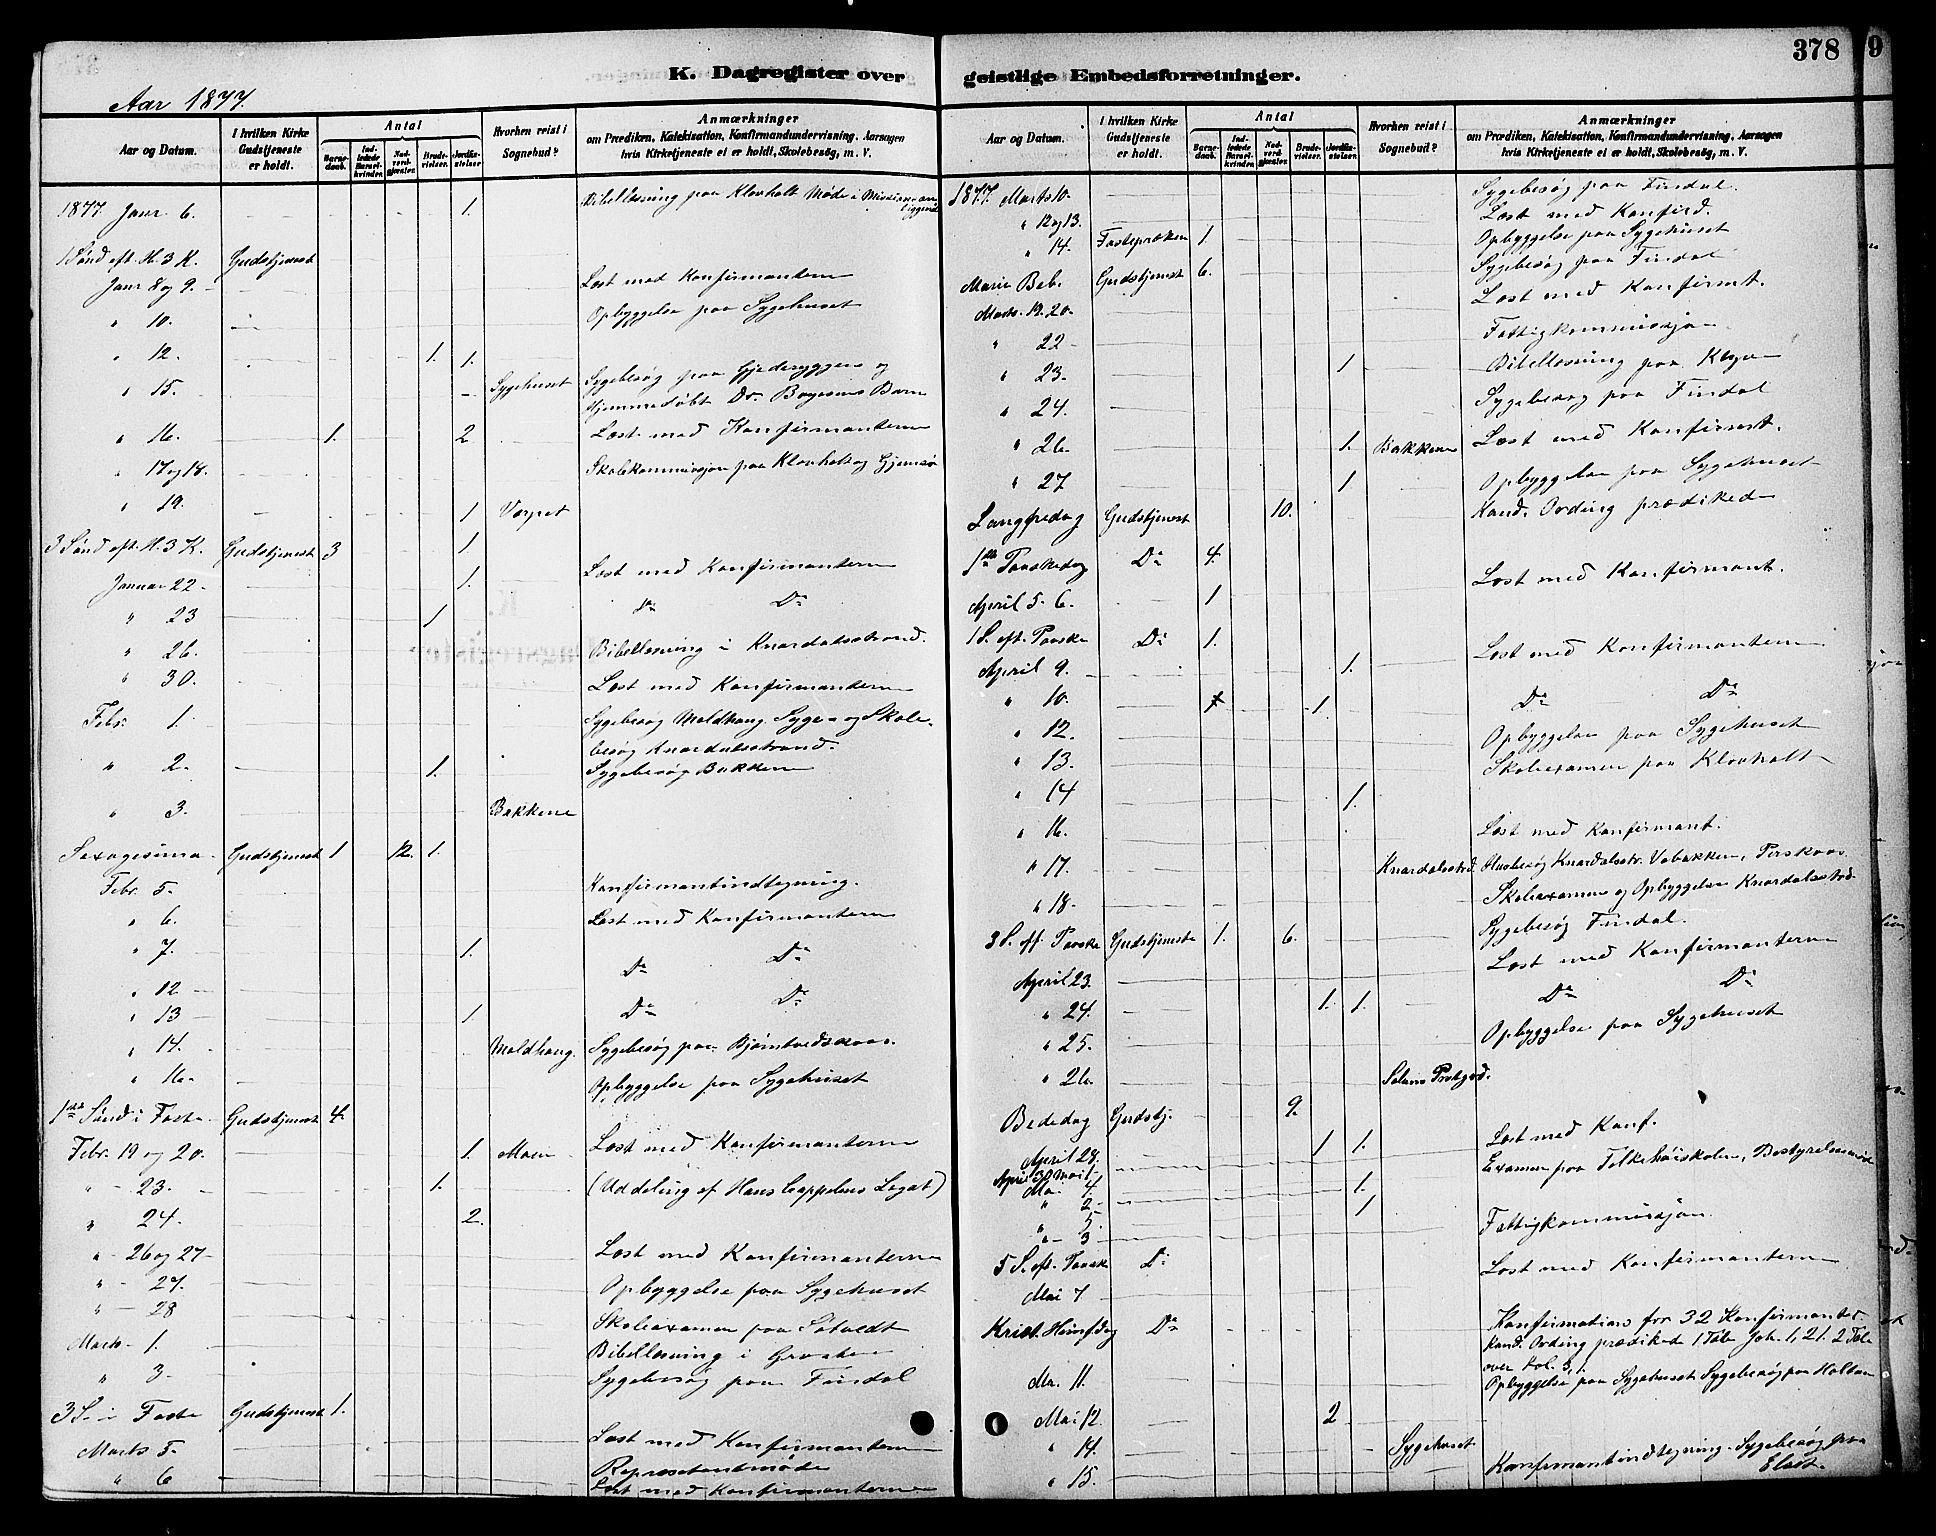 SAKO, Solum kirkebøker, F/Fa/L0009: Ministerialbok nr. I 9, 1877-1887, s. 378